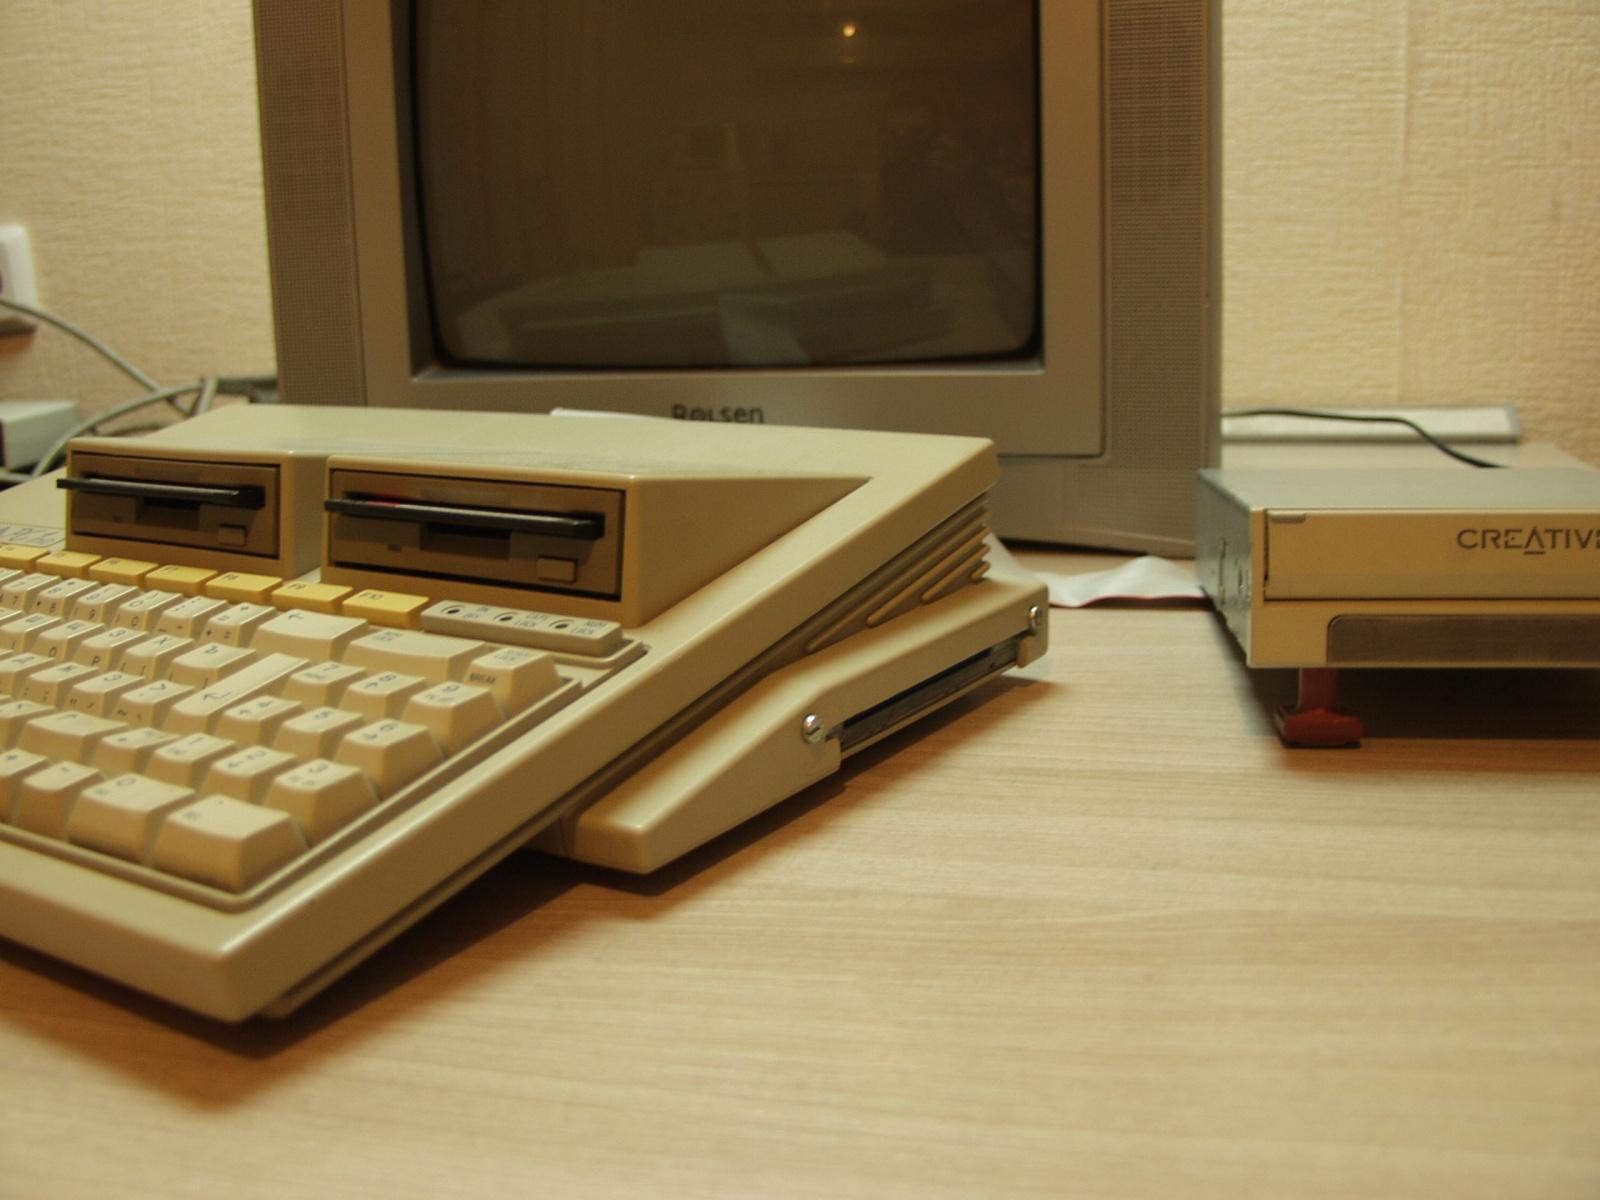 Итальянская IBM-PC Olivetti Prodest PC1 HD - 6